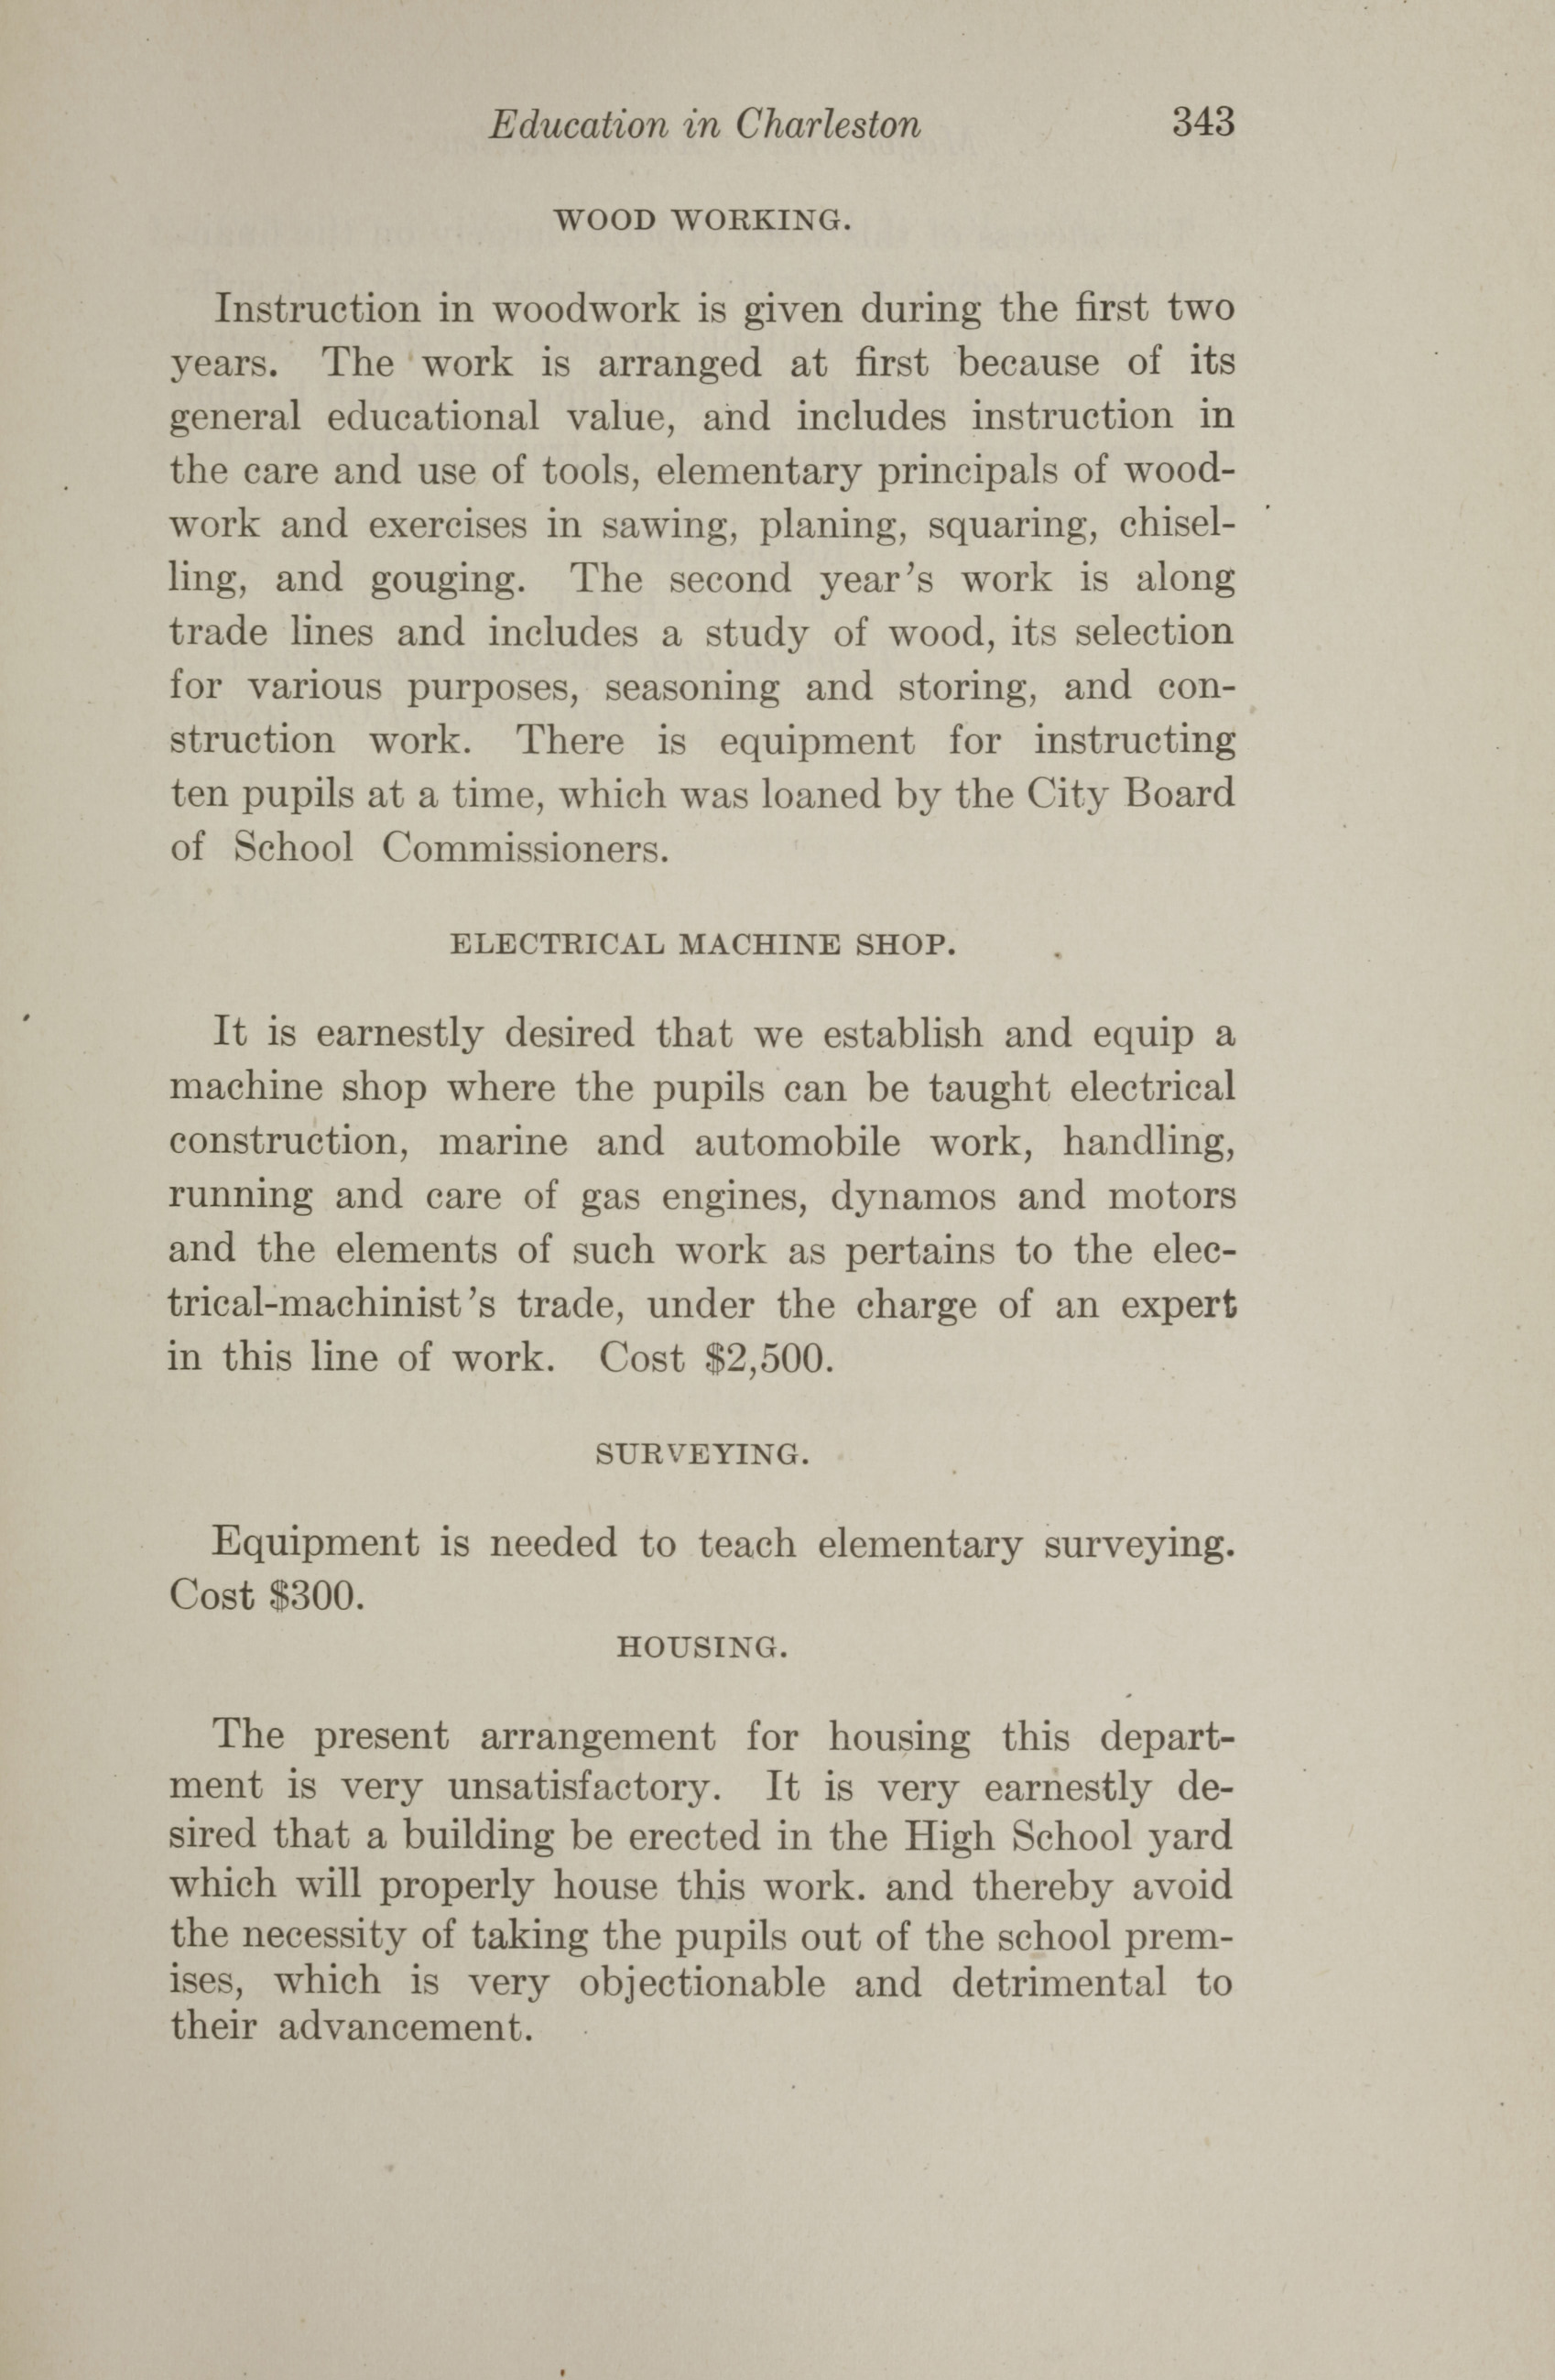 Charleston Yearbook, 1912, page 343